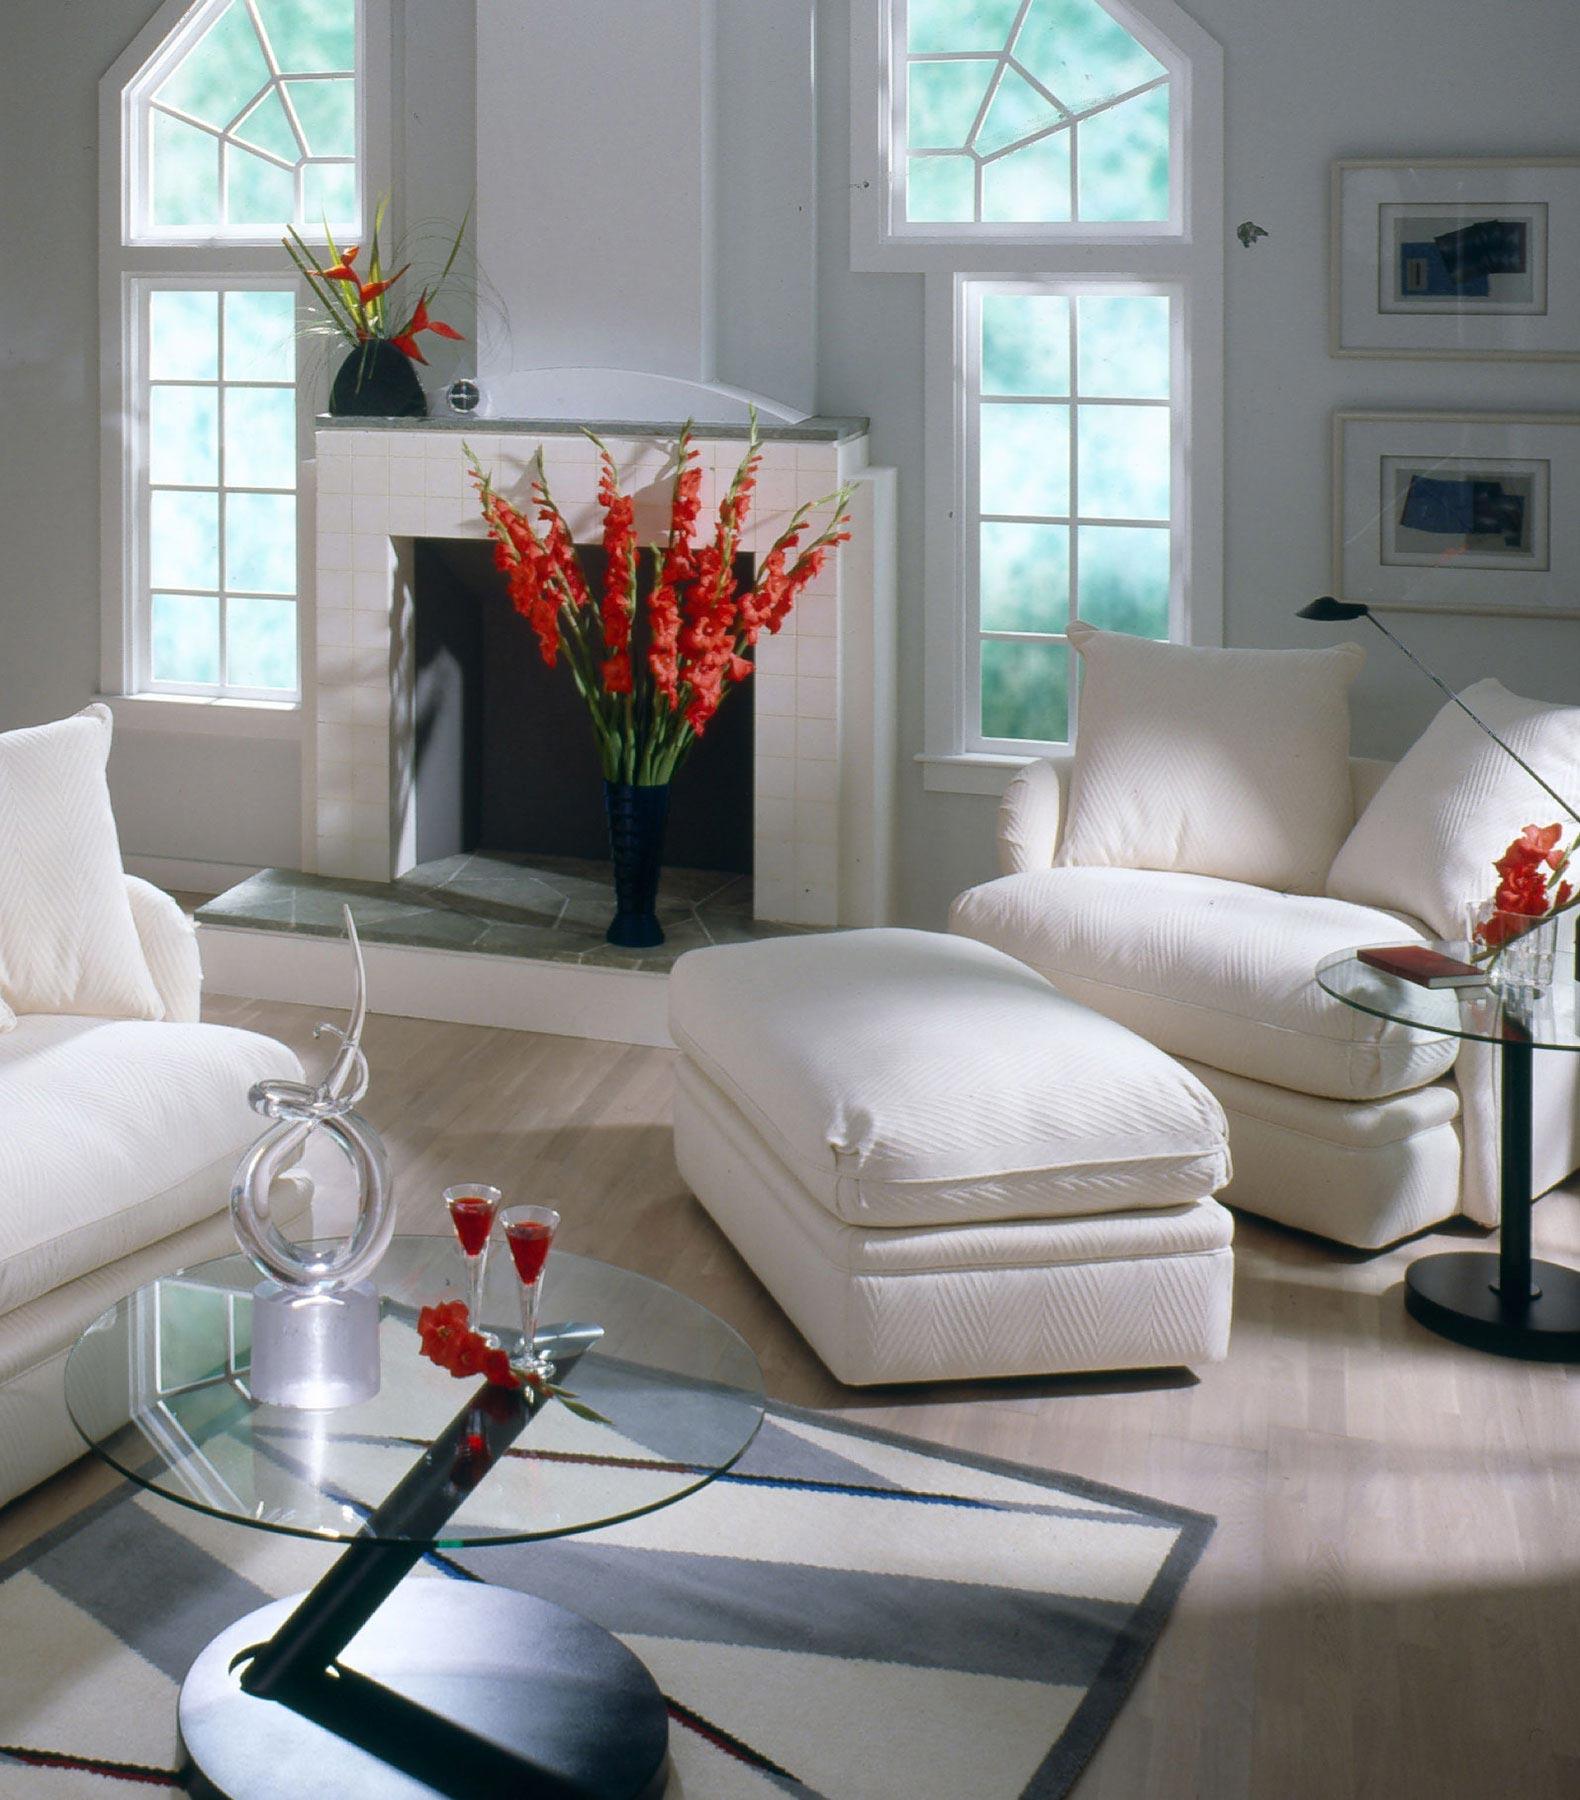 scaninavian-furniture-set16.jpg